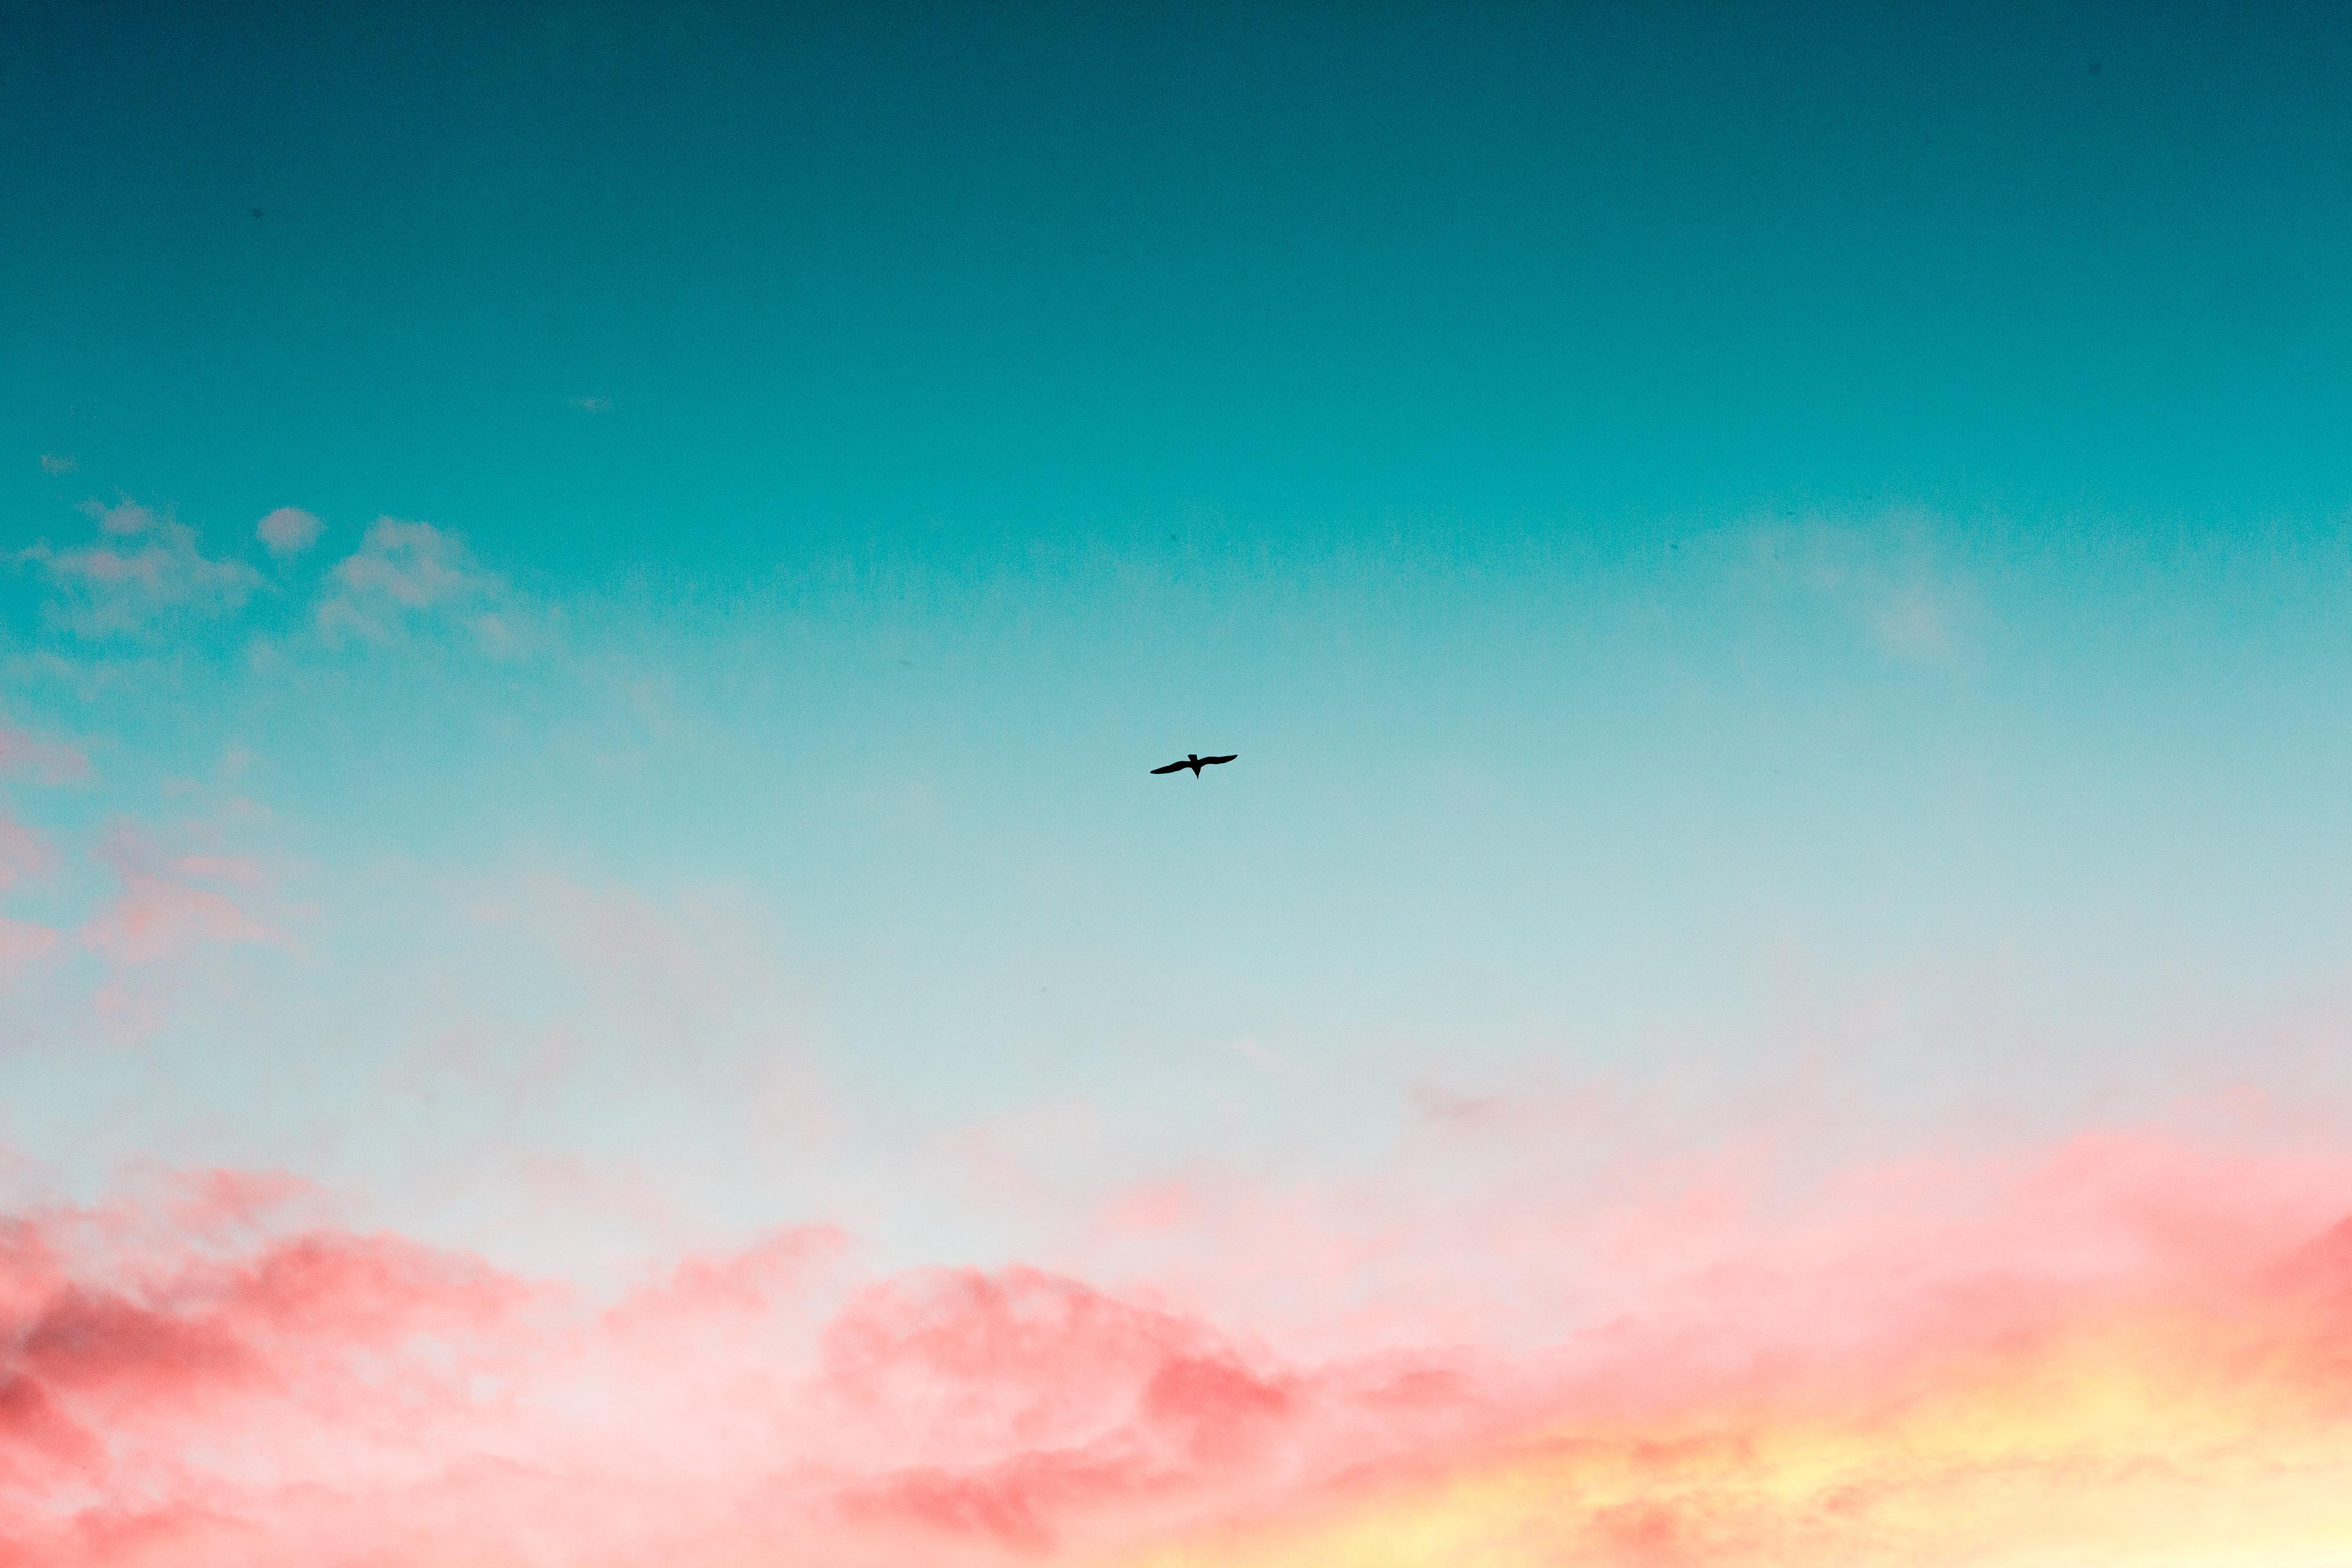 Wallpapers Hd Flying Birds Apple Animals Blue Sky Desktop: 1920x1080 Beautiful Sky Clouds Bird Flying 4k Laptop Full